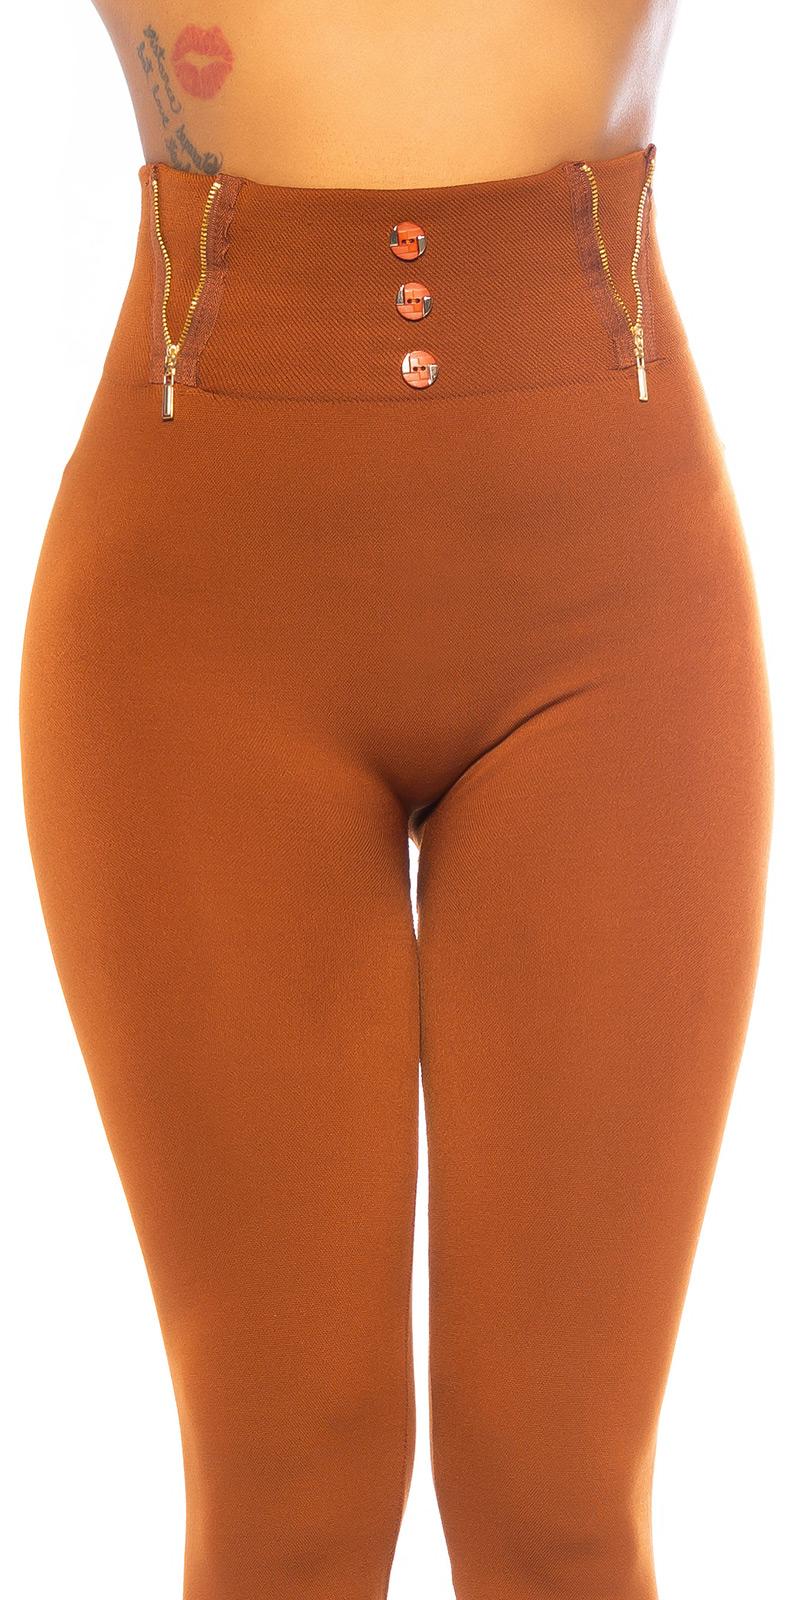 Colanti Sexy cu talie inalta Fashion Thermo /fermoar Detail